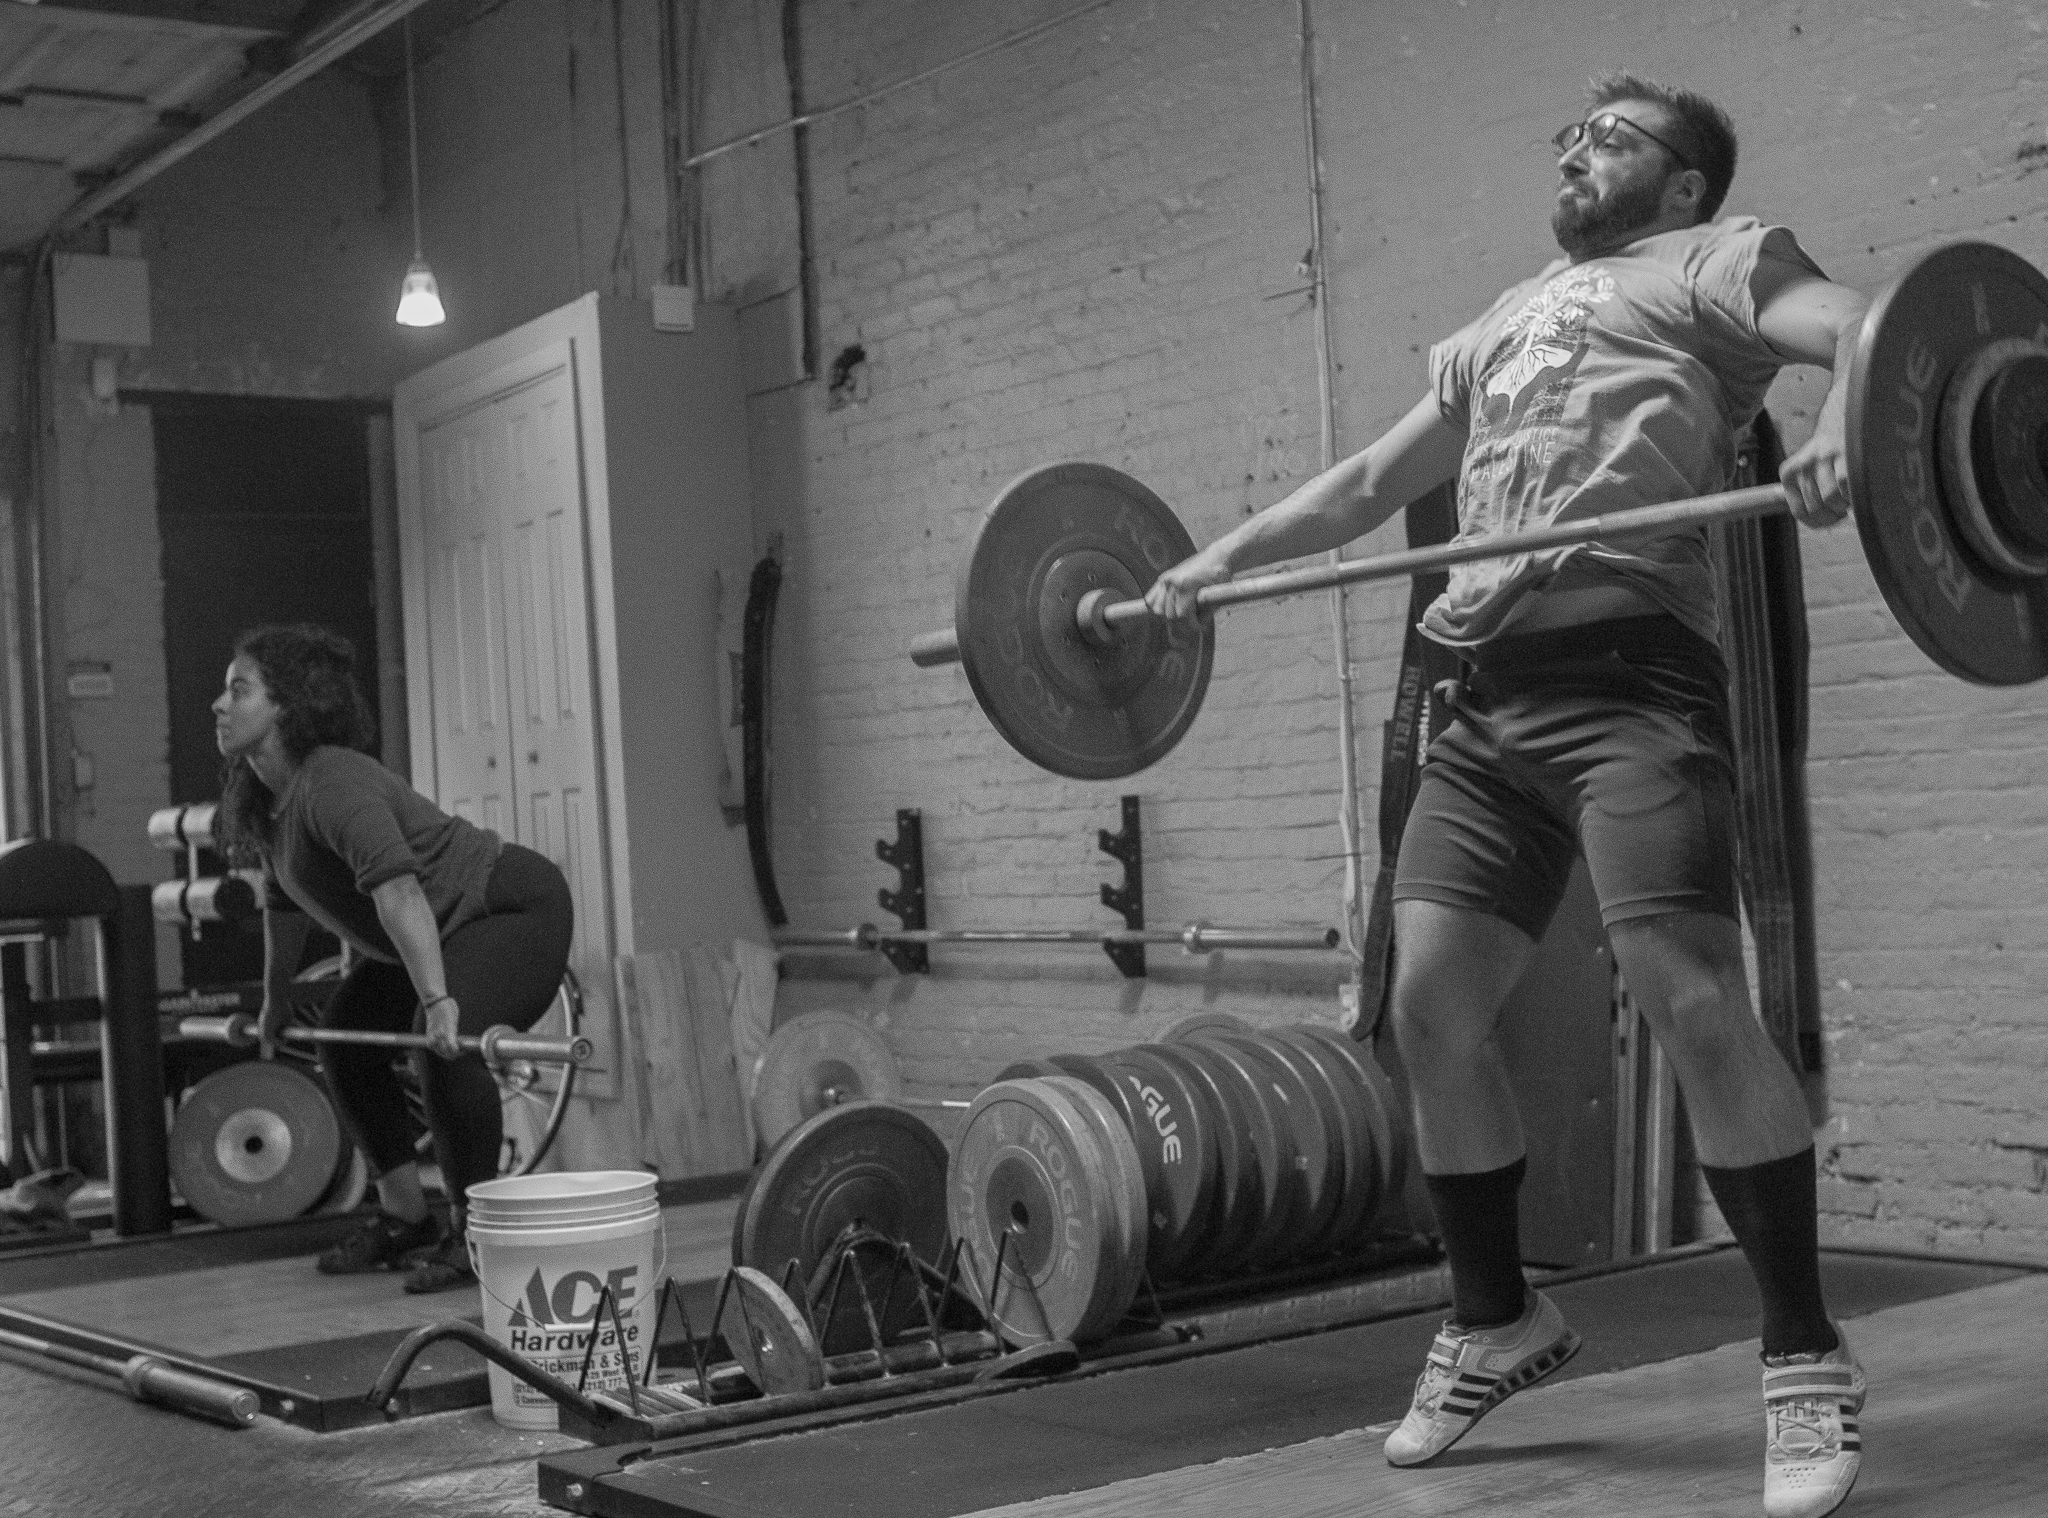 james-wright-visit-brooklyn-new-york-weightlifting-coach-teammates-october-2016 (25 of 92).jpg